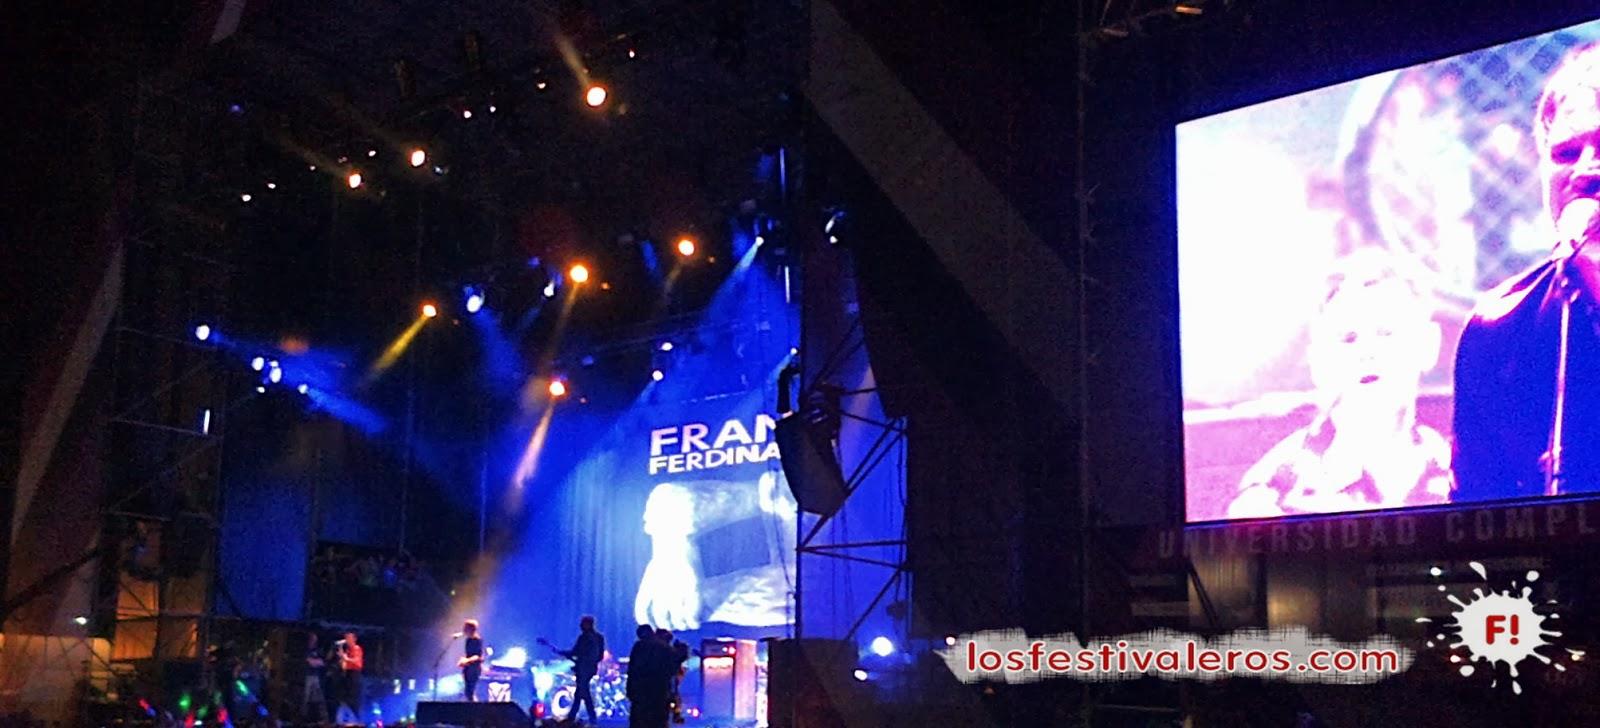 Franz Ferdinand, Bilbao, BBK Live, 2014, Festival, Concierto